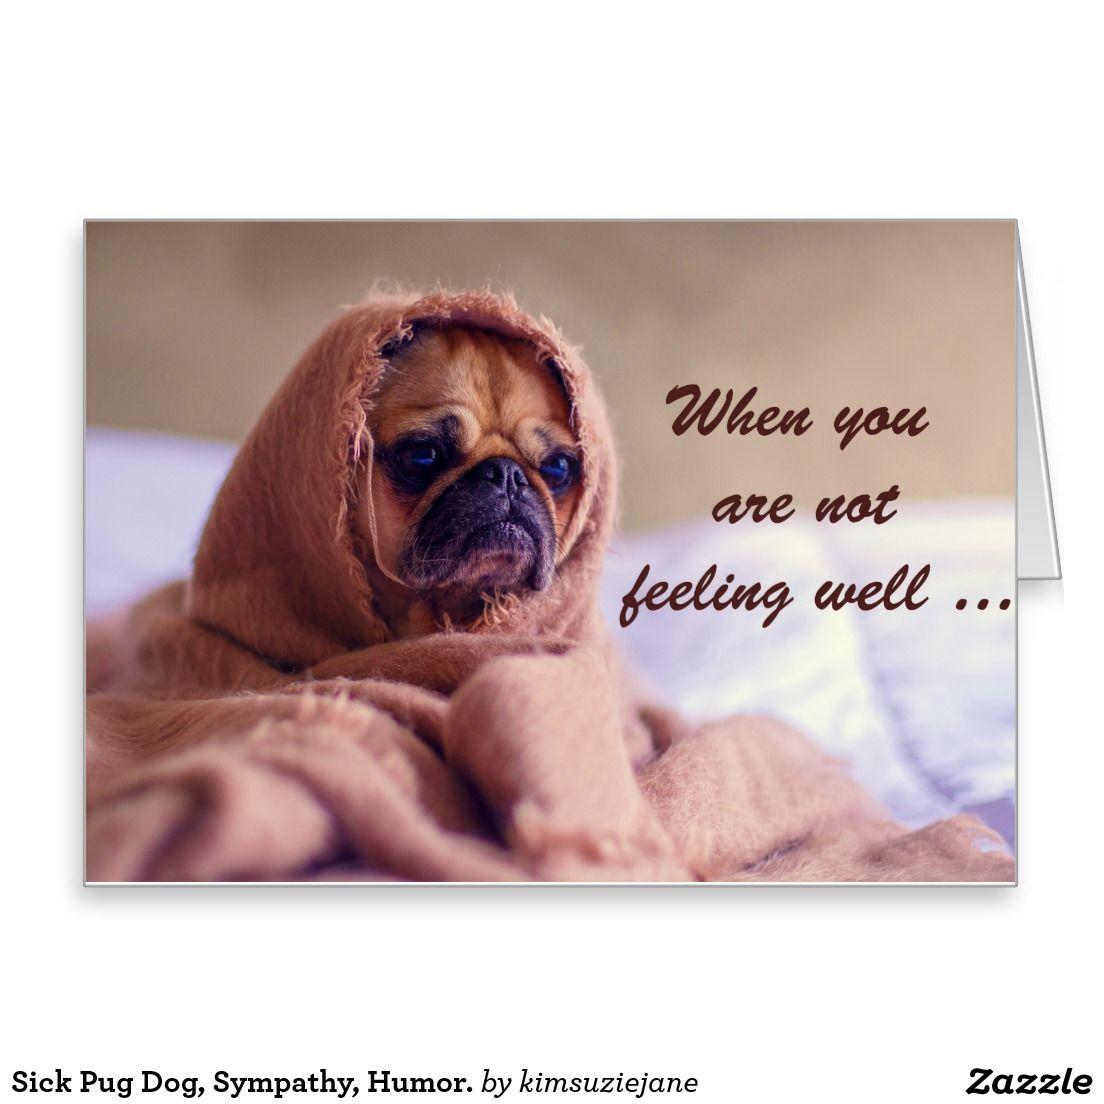 Sick Pug Dog Sympathy Humor Card Zazzle Com Au Pugs Dog